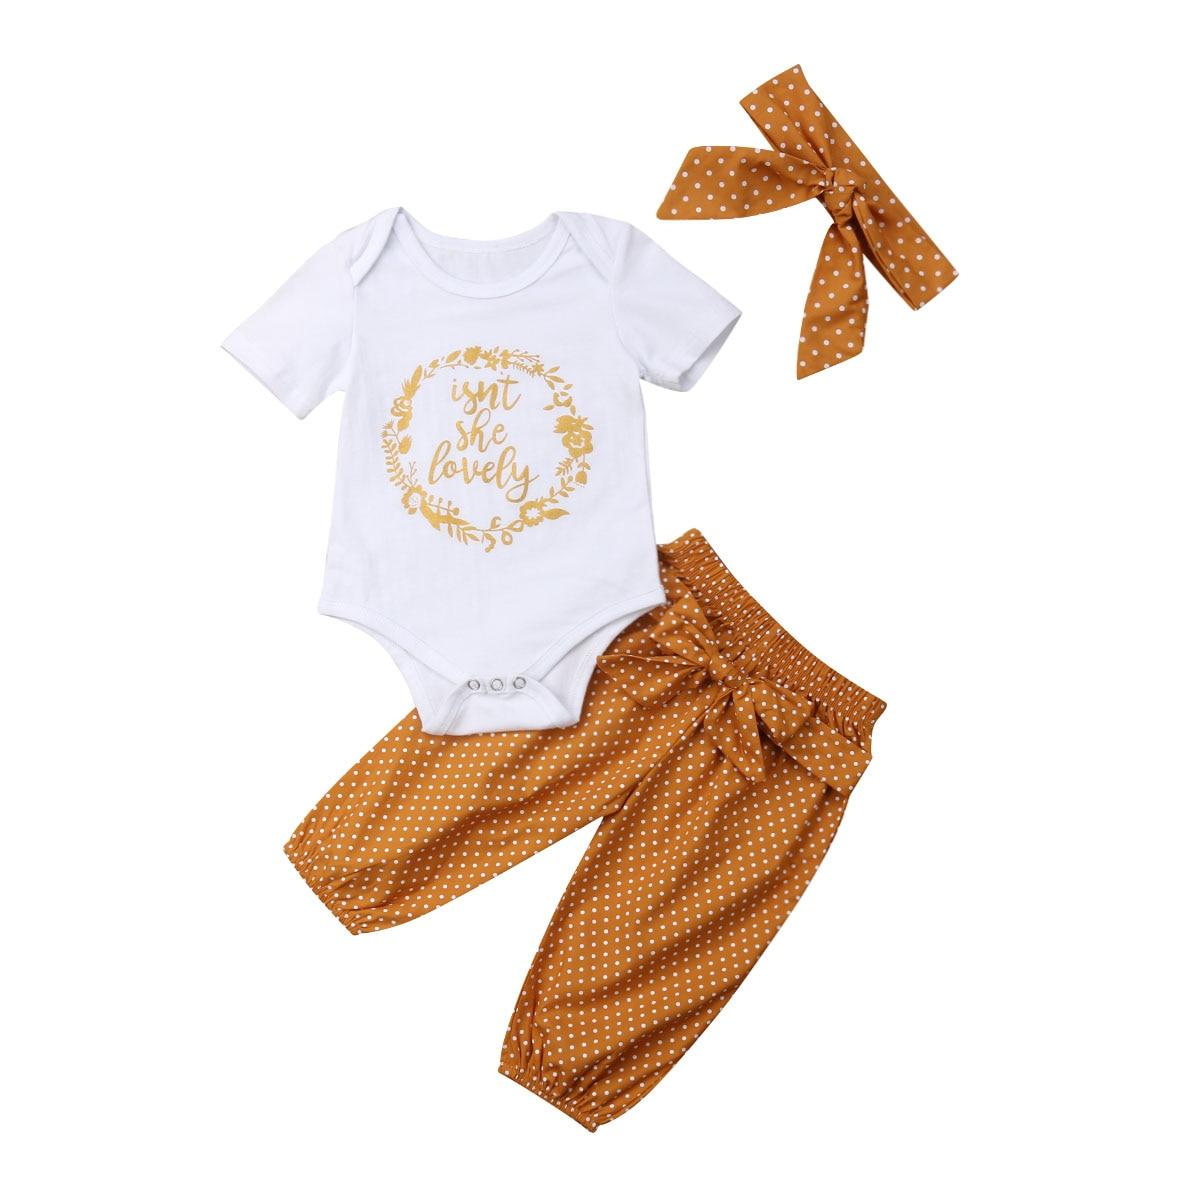 0-18 M Neugeborenen Baby Junge Mädchen Kurzarm Baumwolle Body Tops Dot Lange Hose Hosen Stirnband 3 Pcs Outfits Sommer Kleidung Set